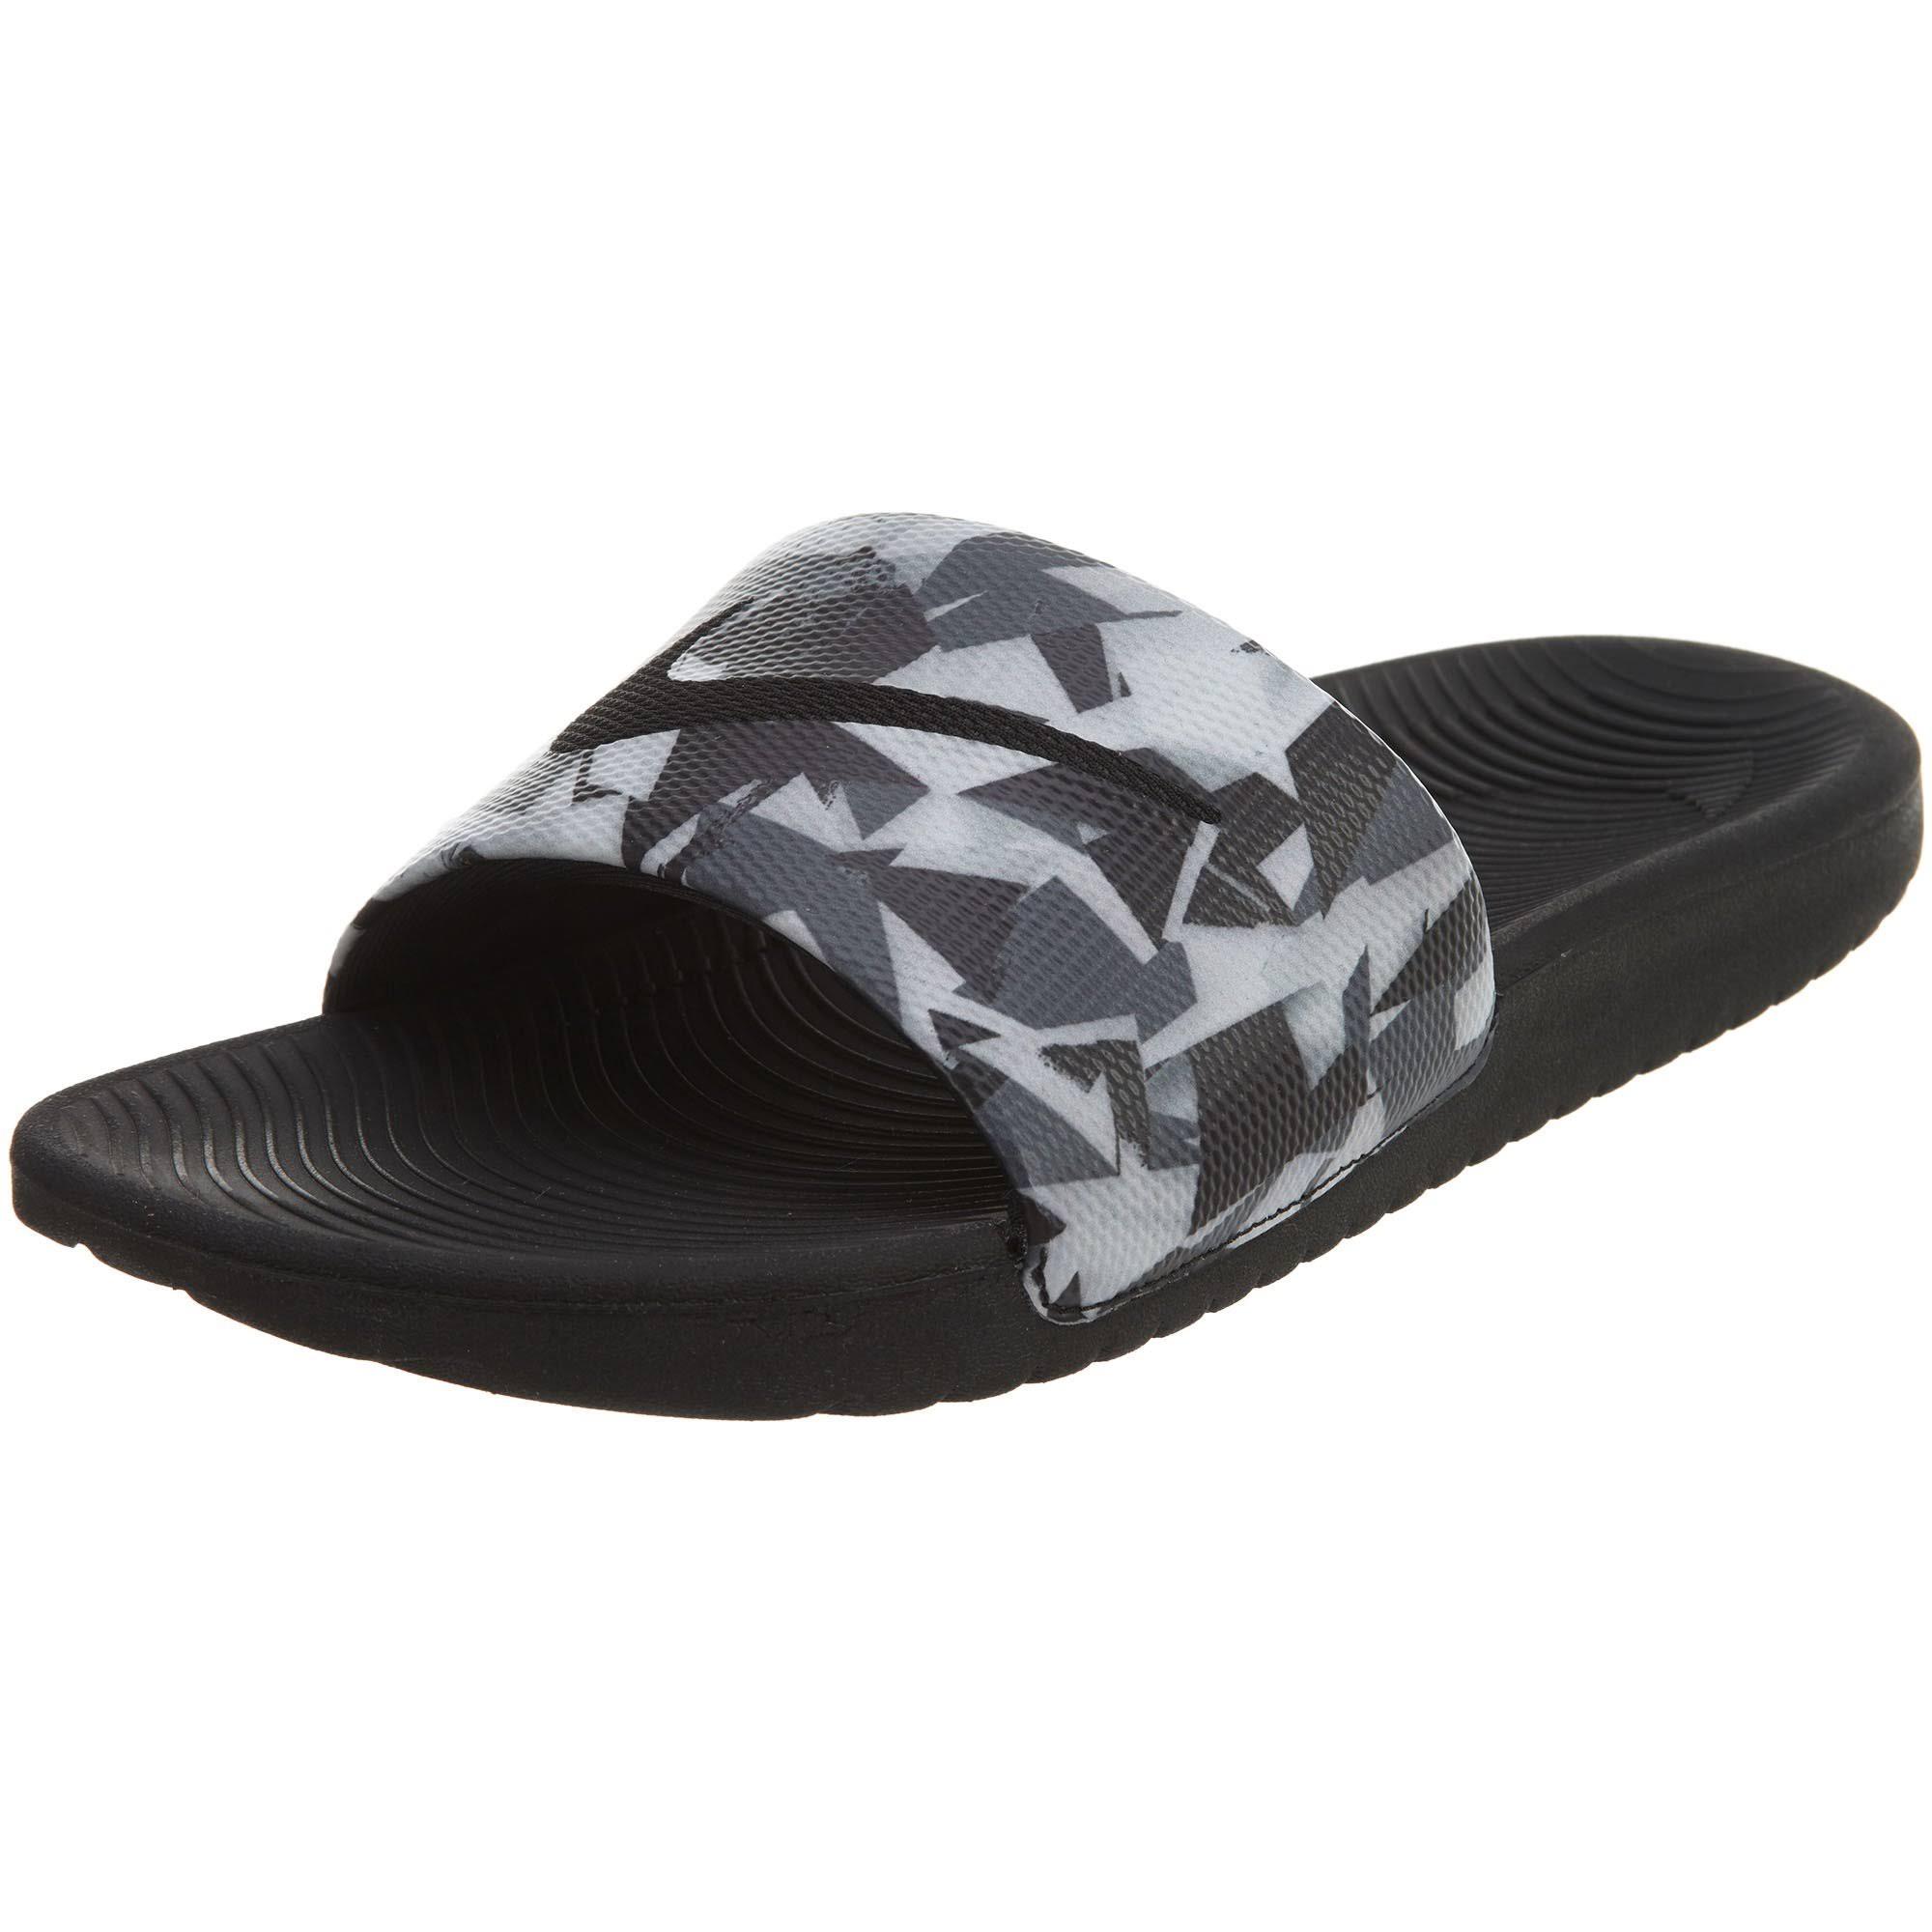 882701001 Slide Kawa Tamaño Nike 8 Hombre qB4wSt5U